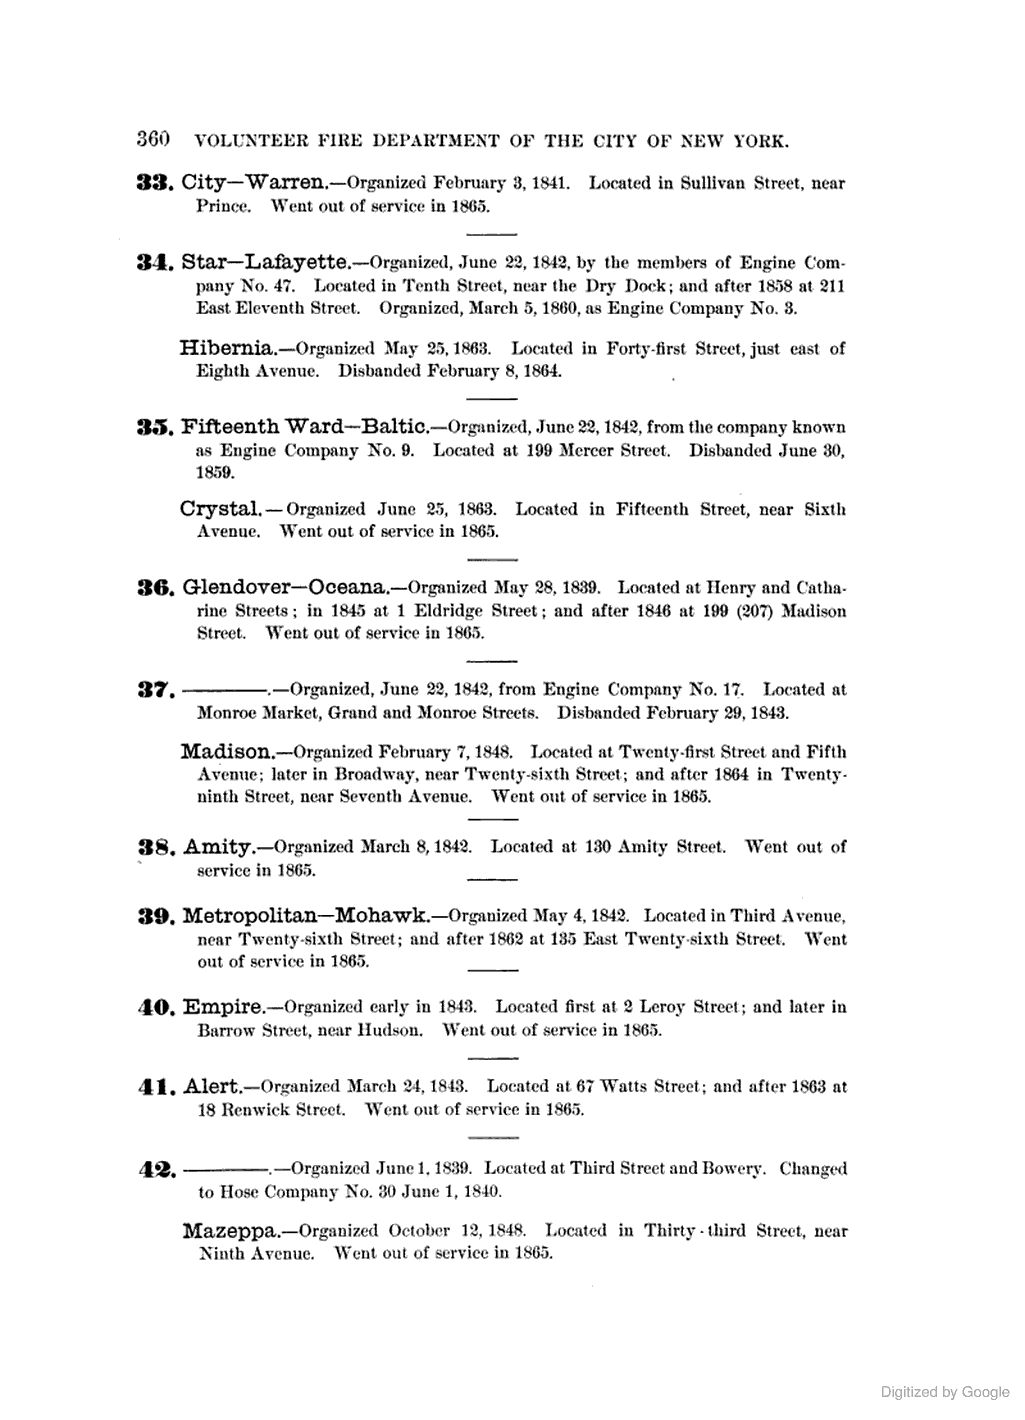 [1884]: HOSE COMPANIES. (p.4) [Sheldon, GEO. 1885, The